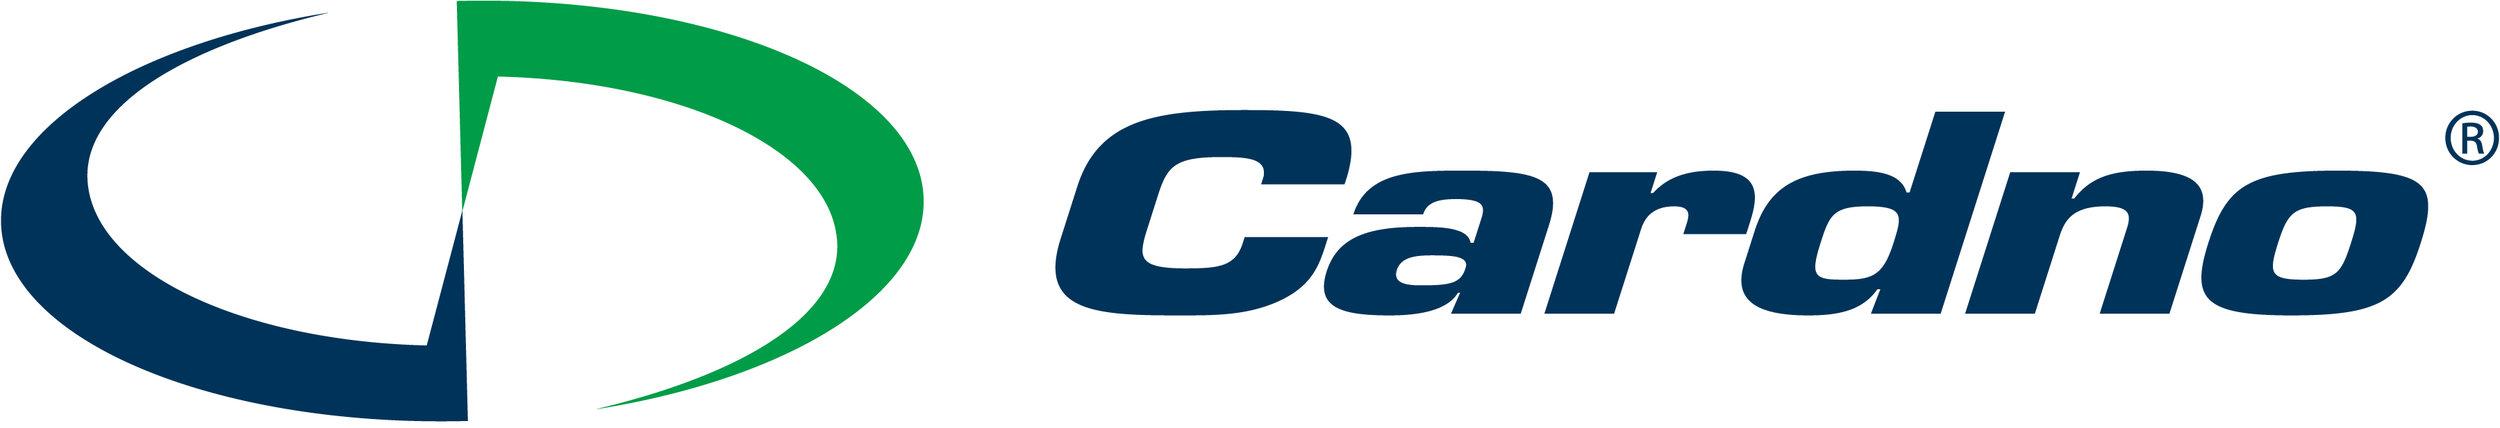 Cardno_RGB_Logo.jpg